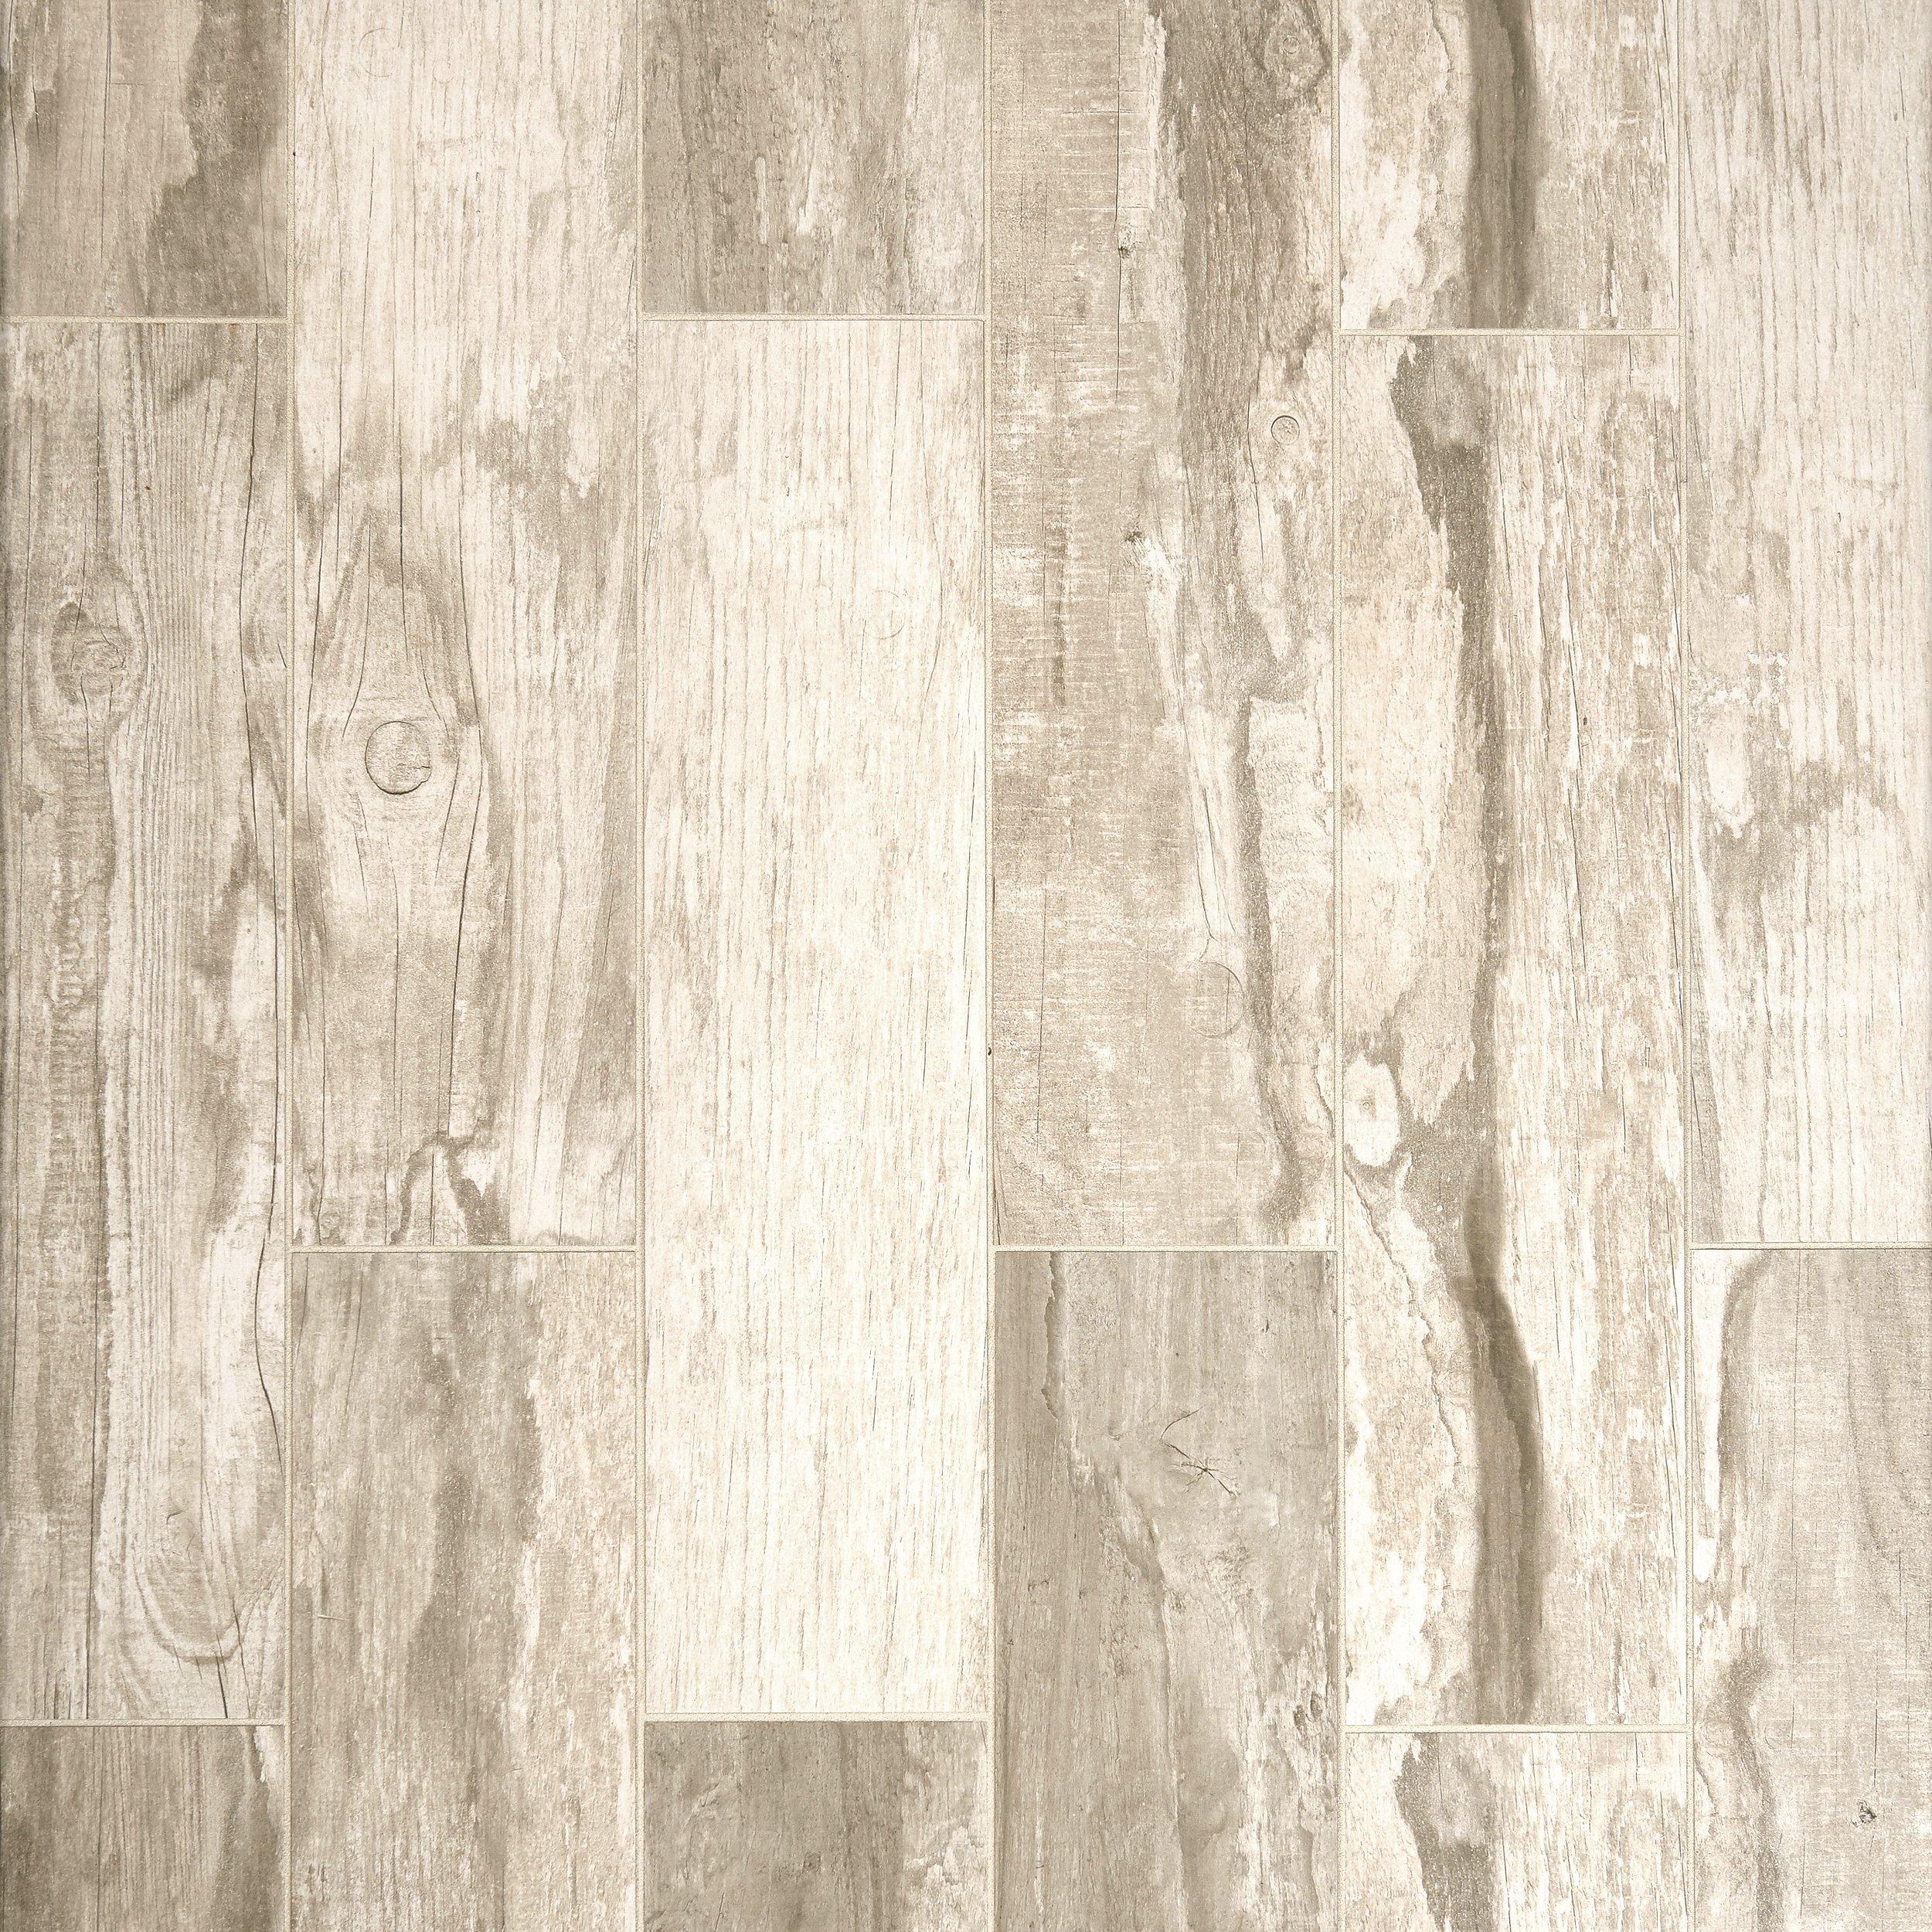 birch forest gray iii wood plank